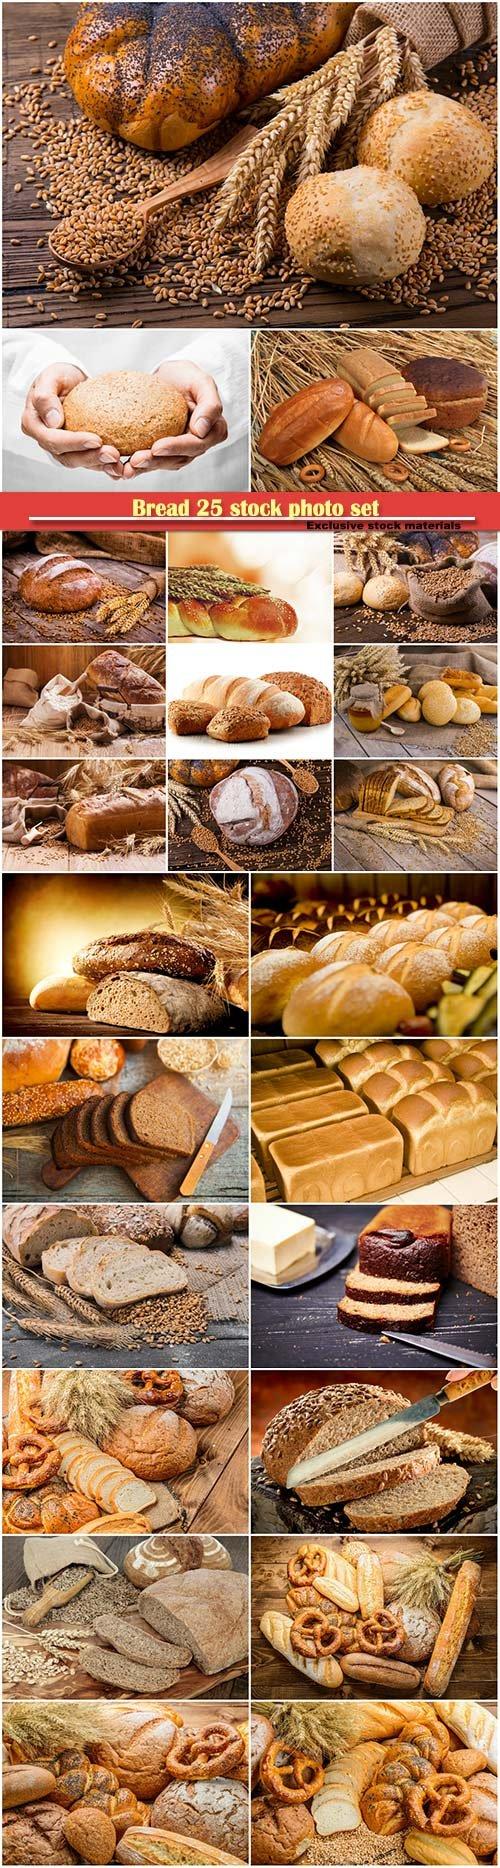 Bread 25 stock photo set